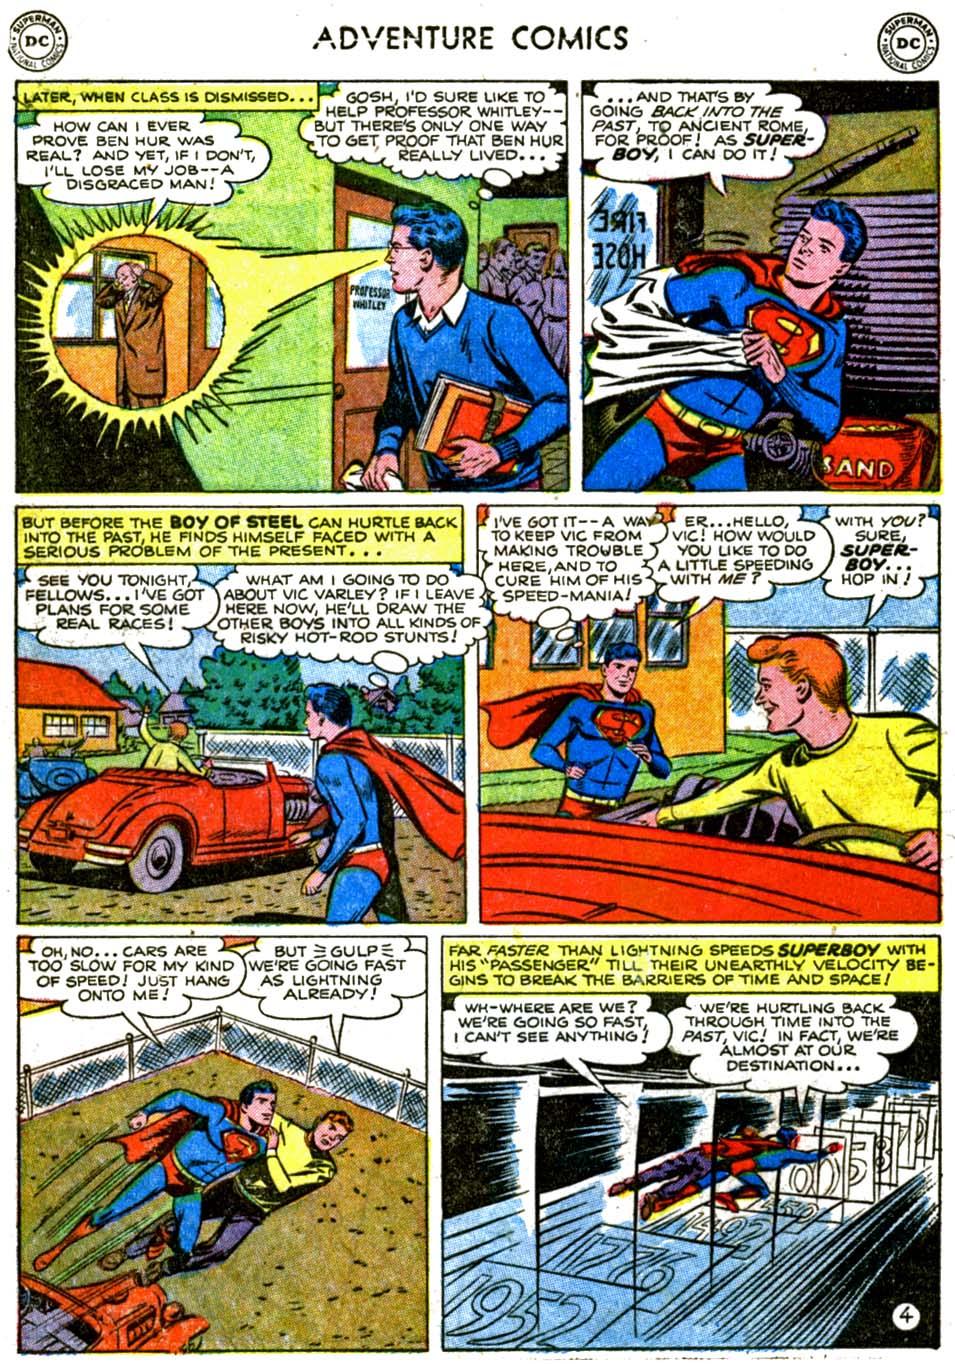 Read online Adventure Comics (1938) comic -  Issue #177 - 6